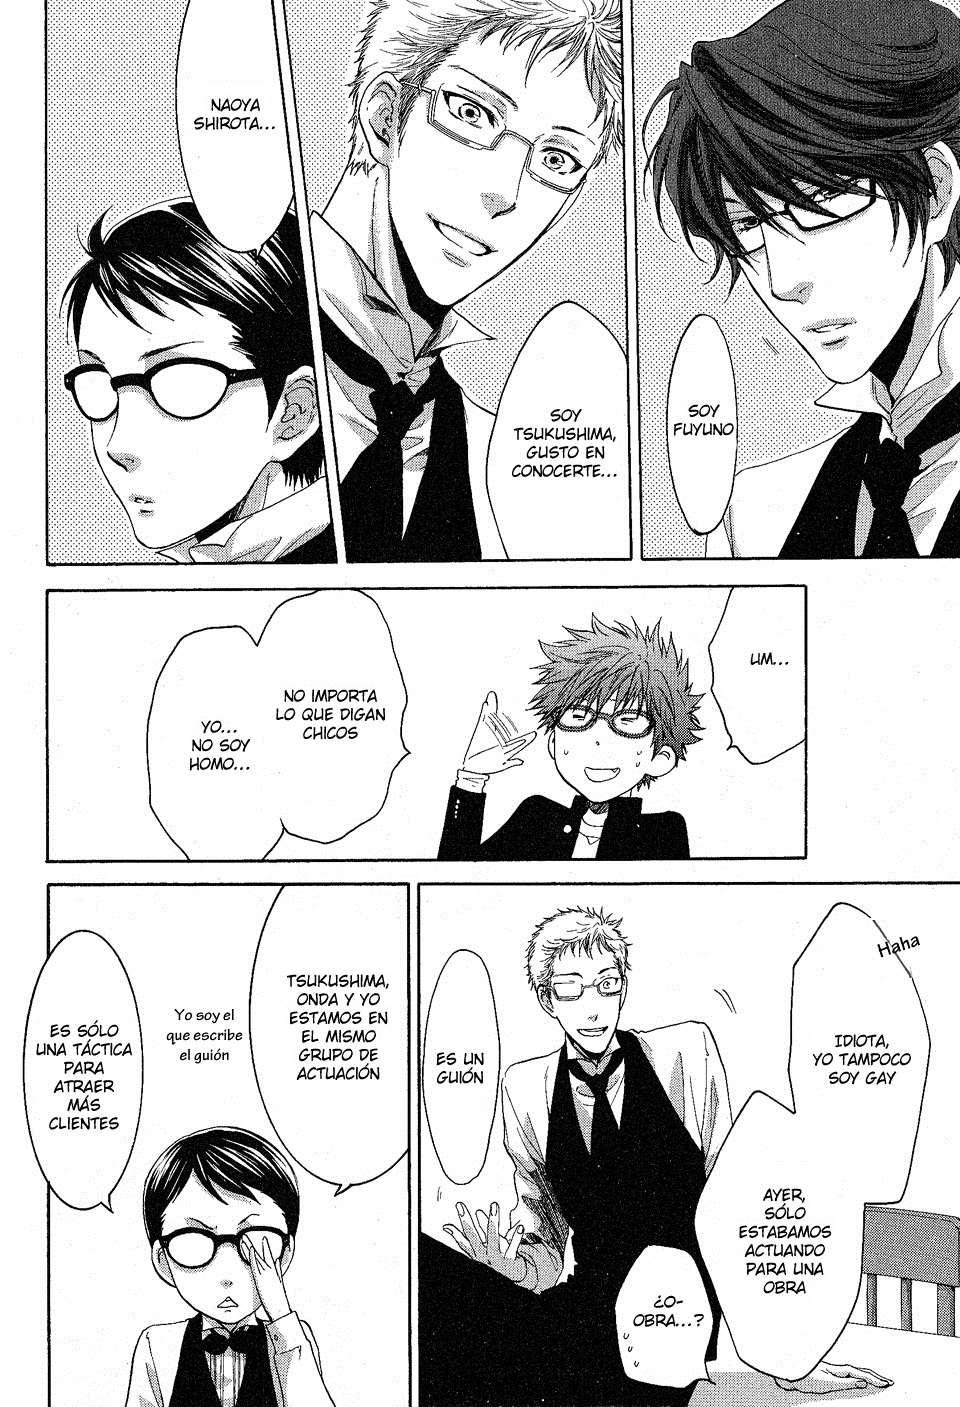 https://c5.ninemanga.com/es_manga/6/15814/378262/6f613b747464280be95f8e970625231d.jpg Page 38